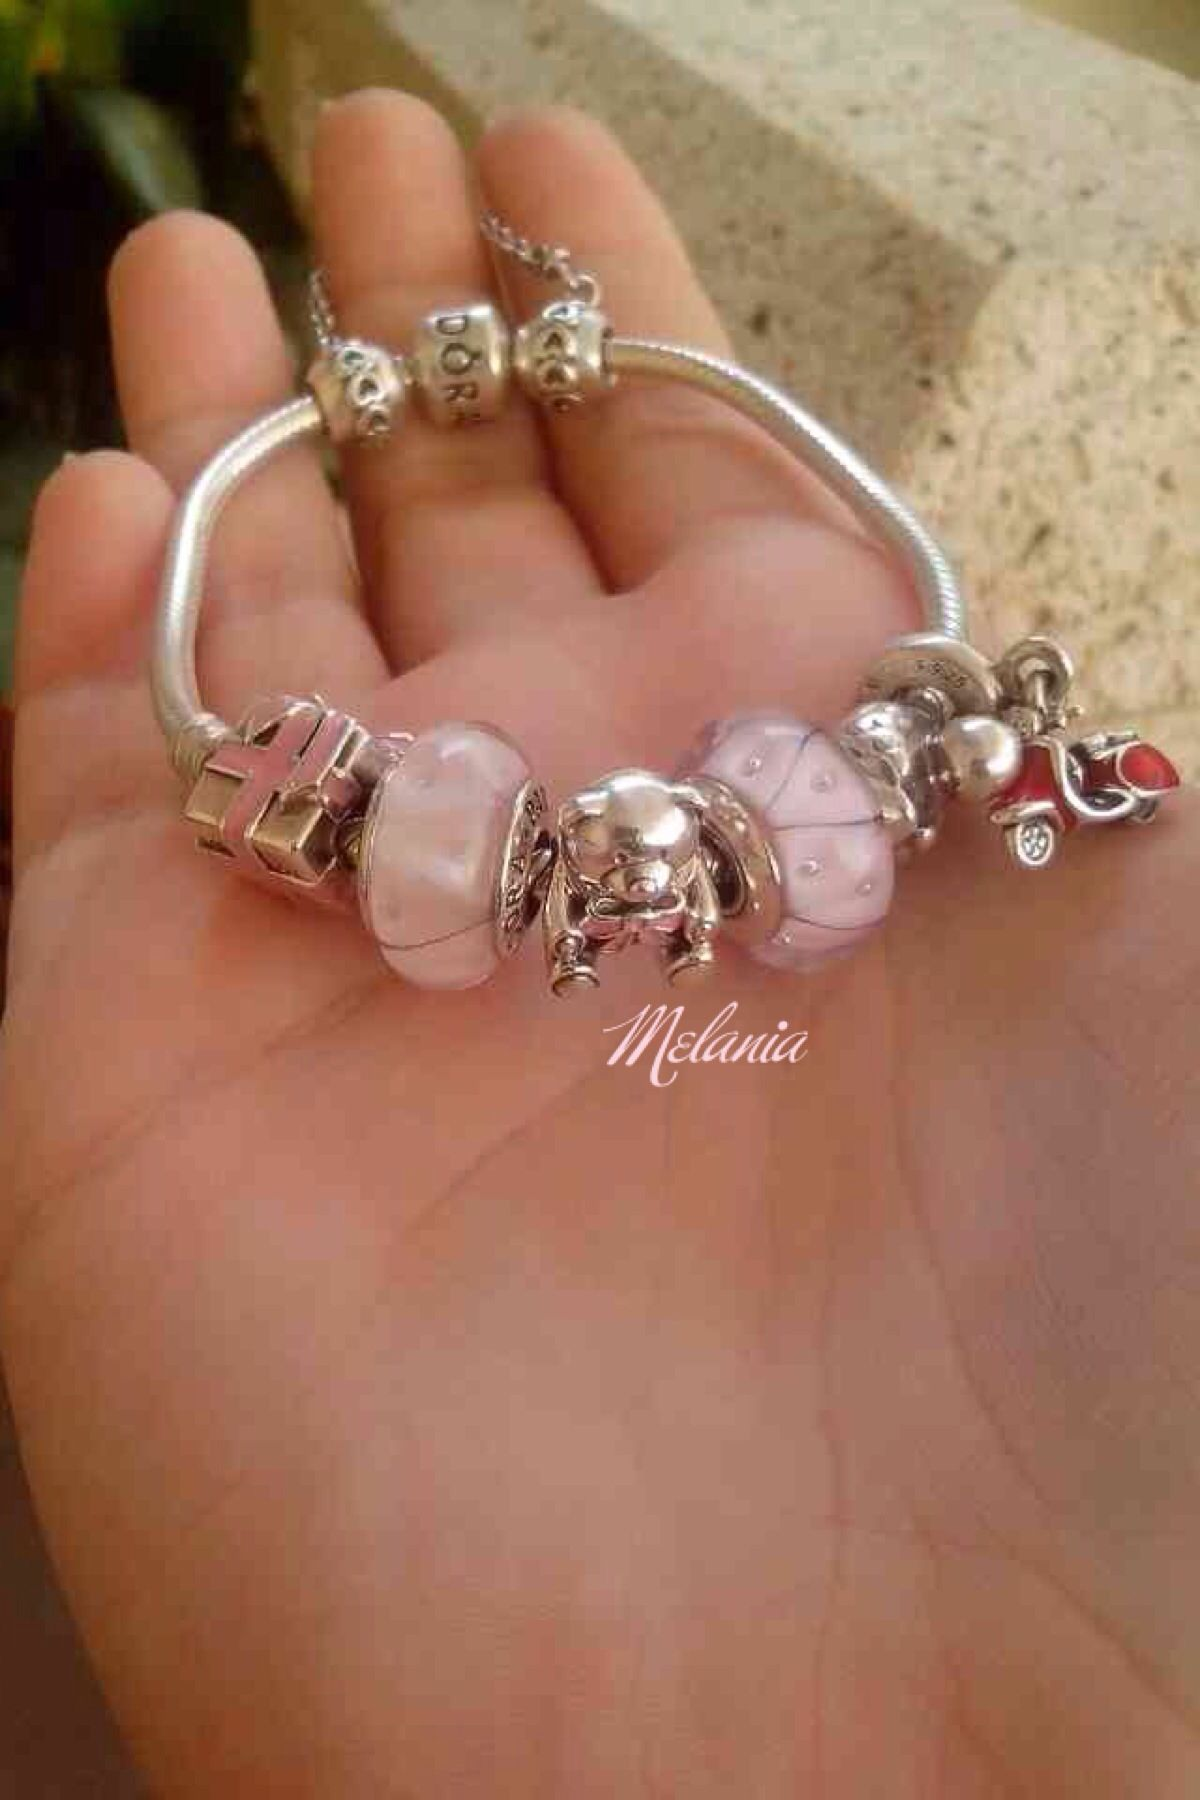 a1068505a Pandora pink bracelet bear gift birth baby girl Vos Pandora Vos créations  Your creation Des bracelets